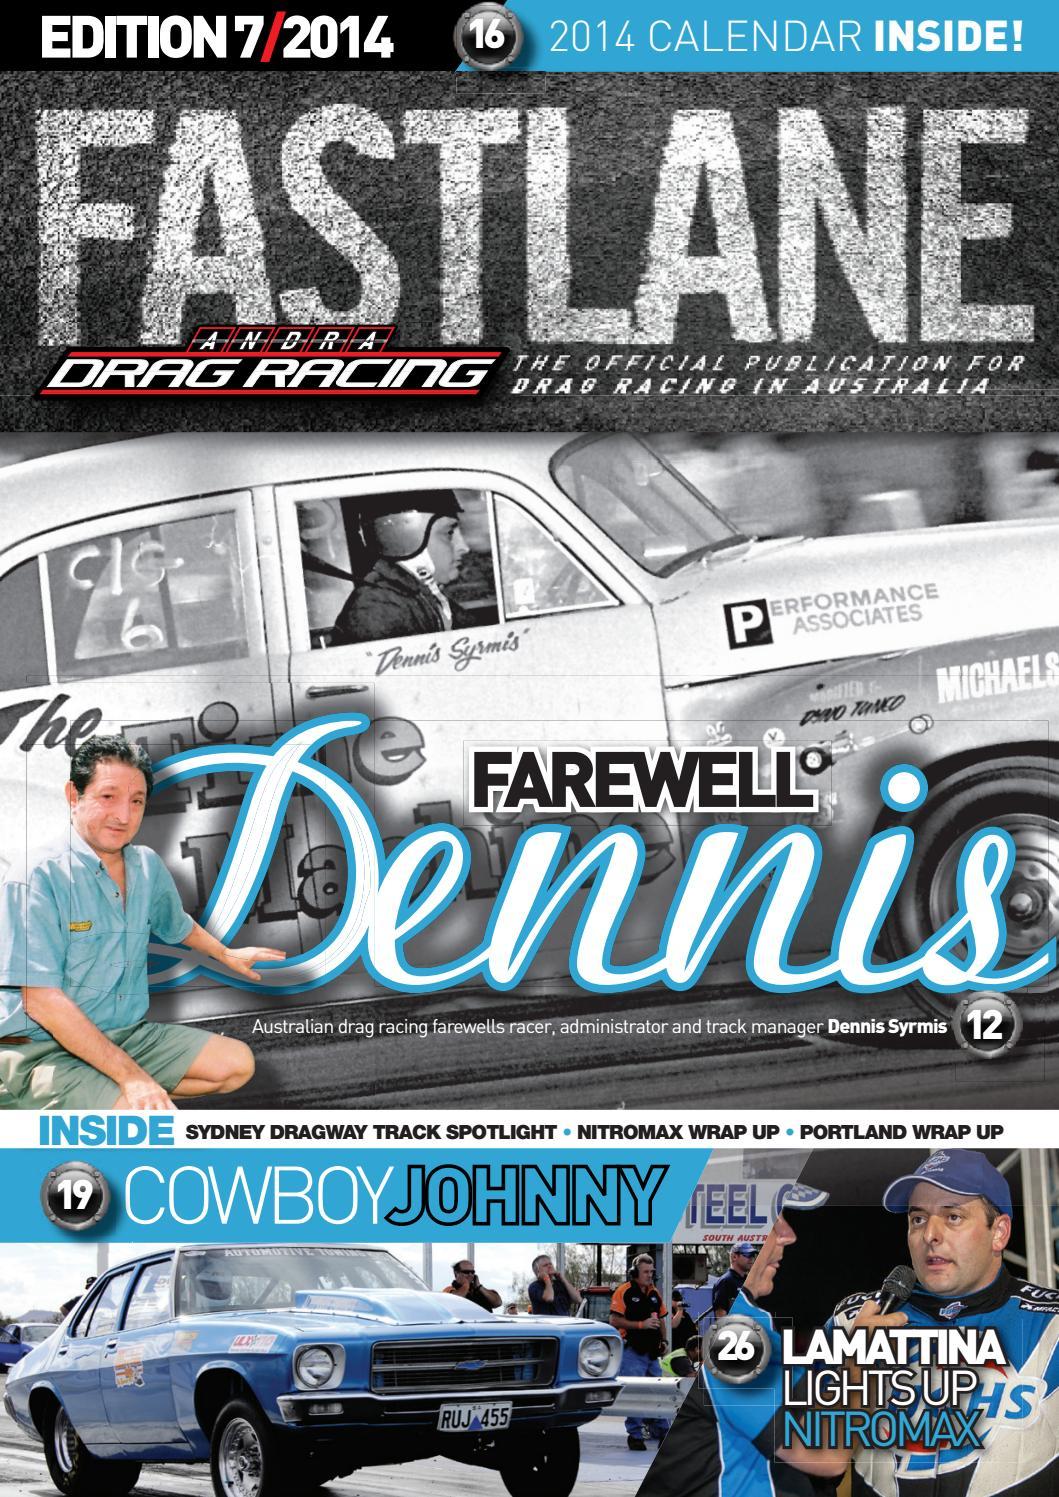 Fastlane Magazine  Issue 7 By Andra Drag Racing  Issuu intended for Benaraby Raceway Calendar